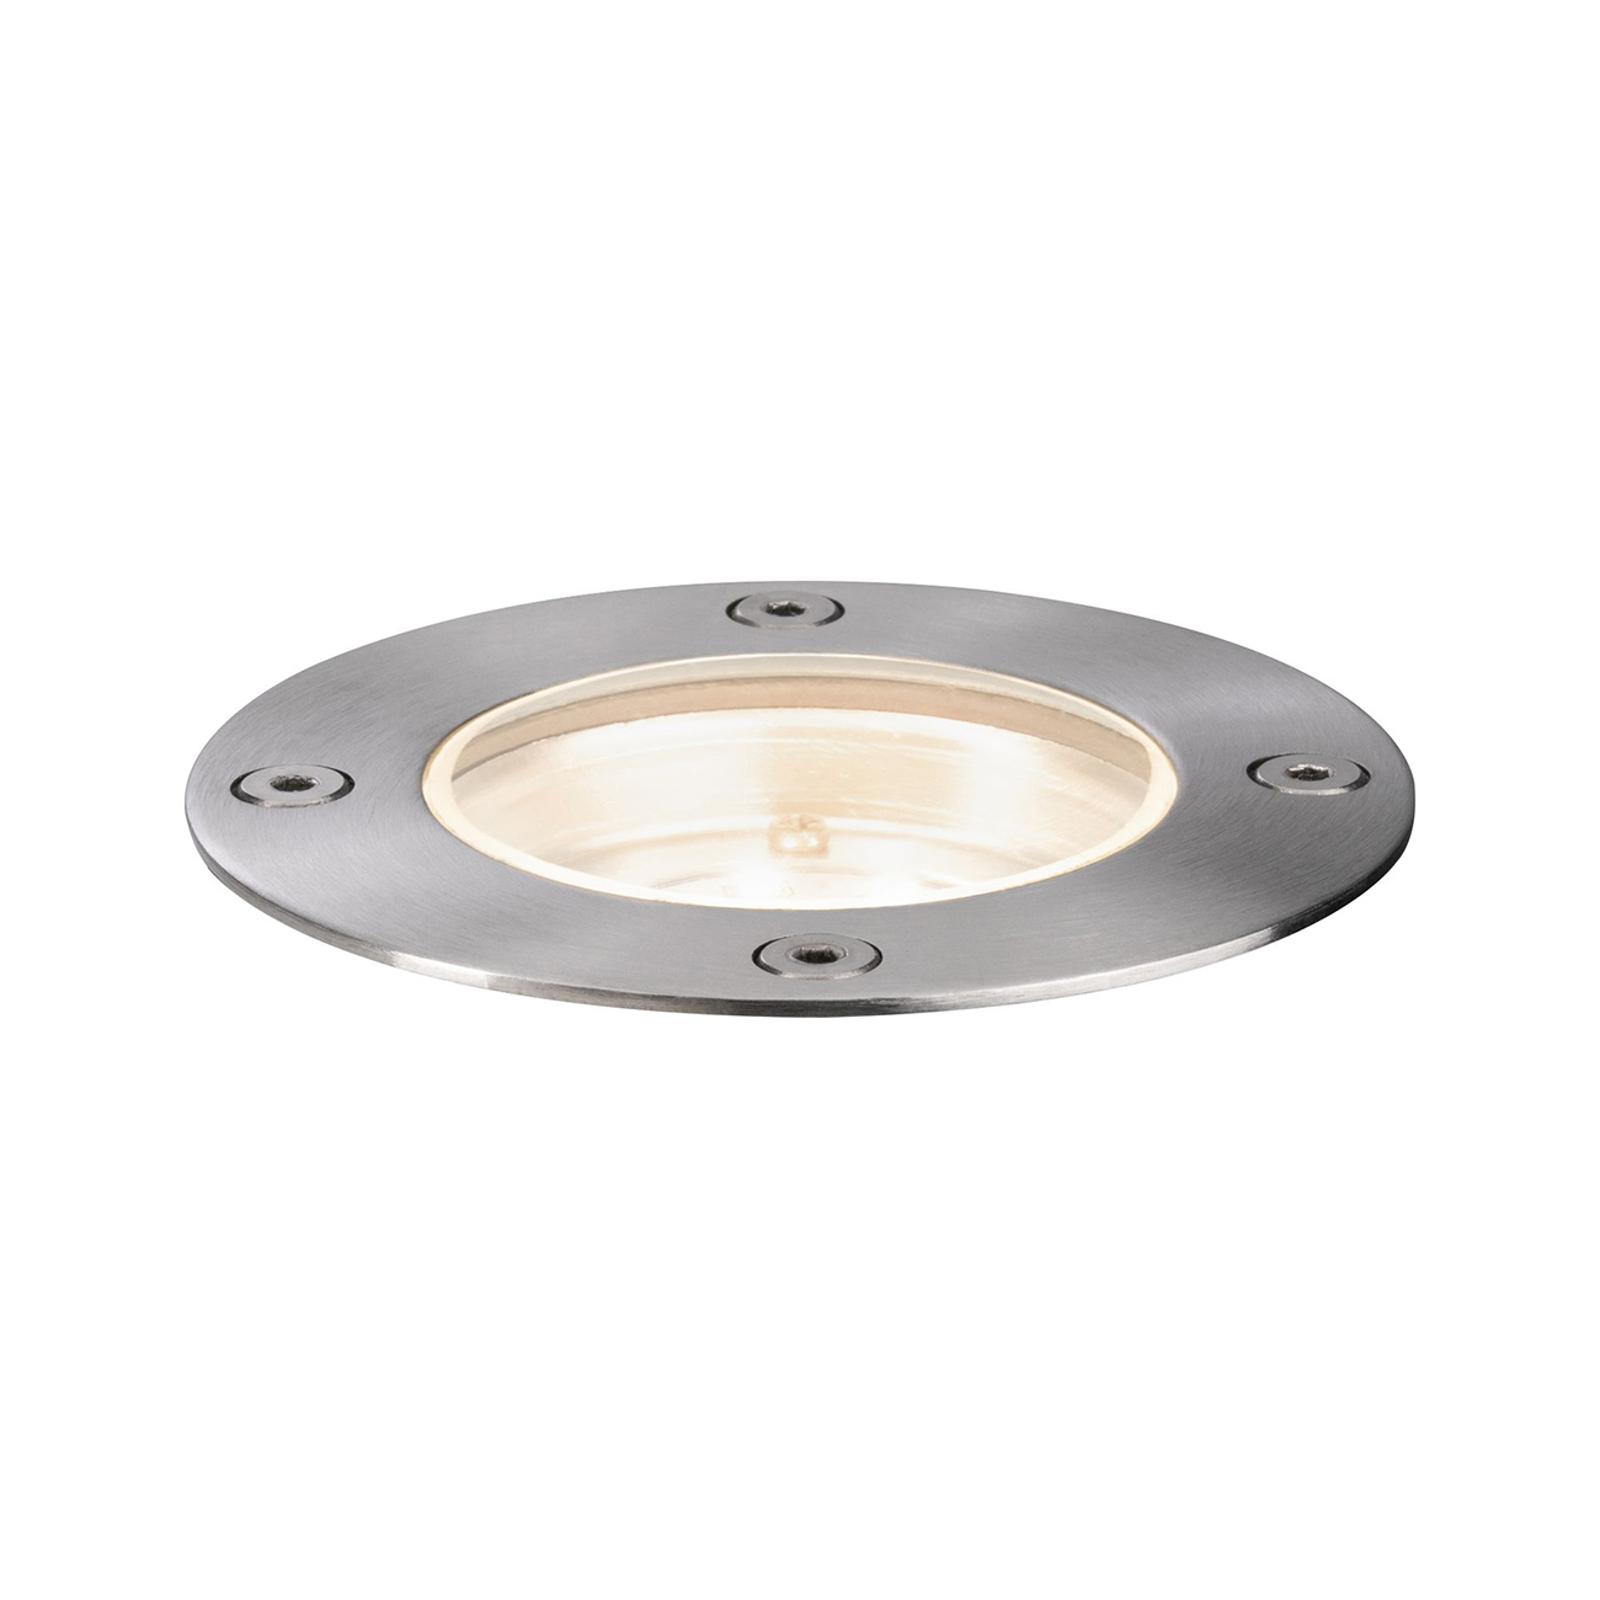 Paulmann Plug & Shine spot enc. au sol LED 94228